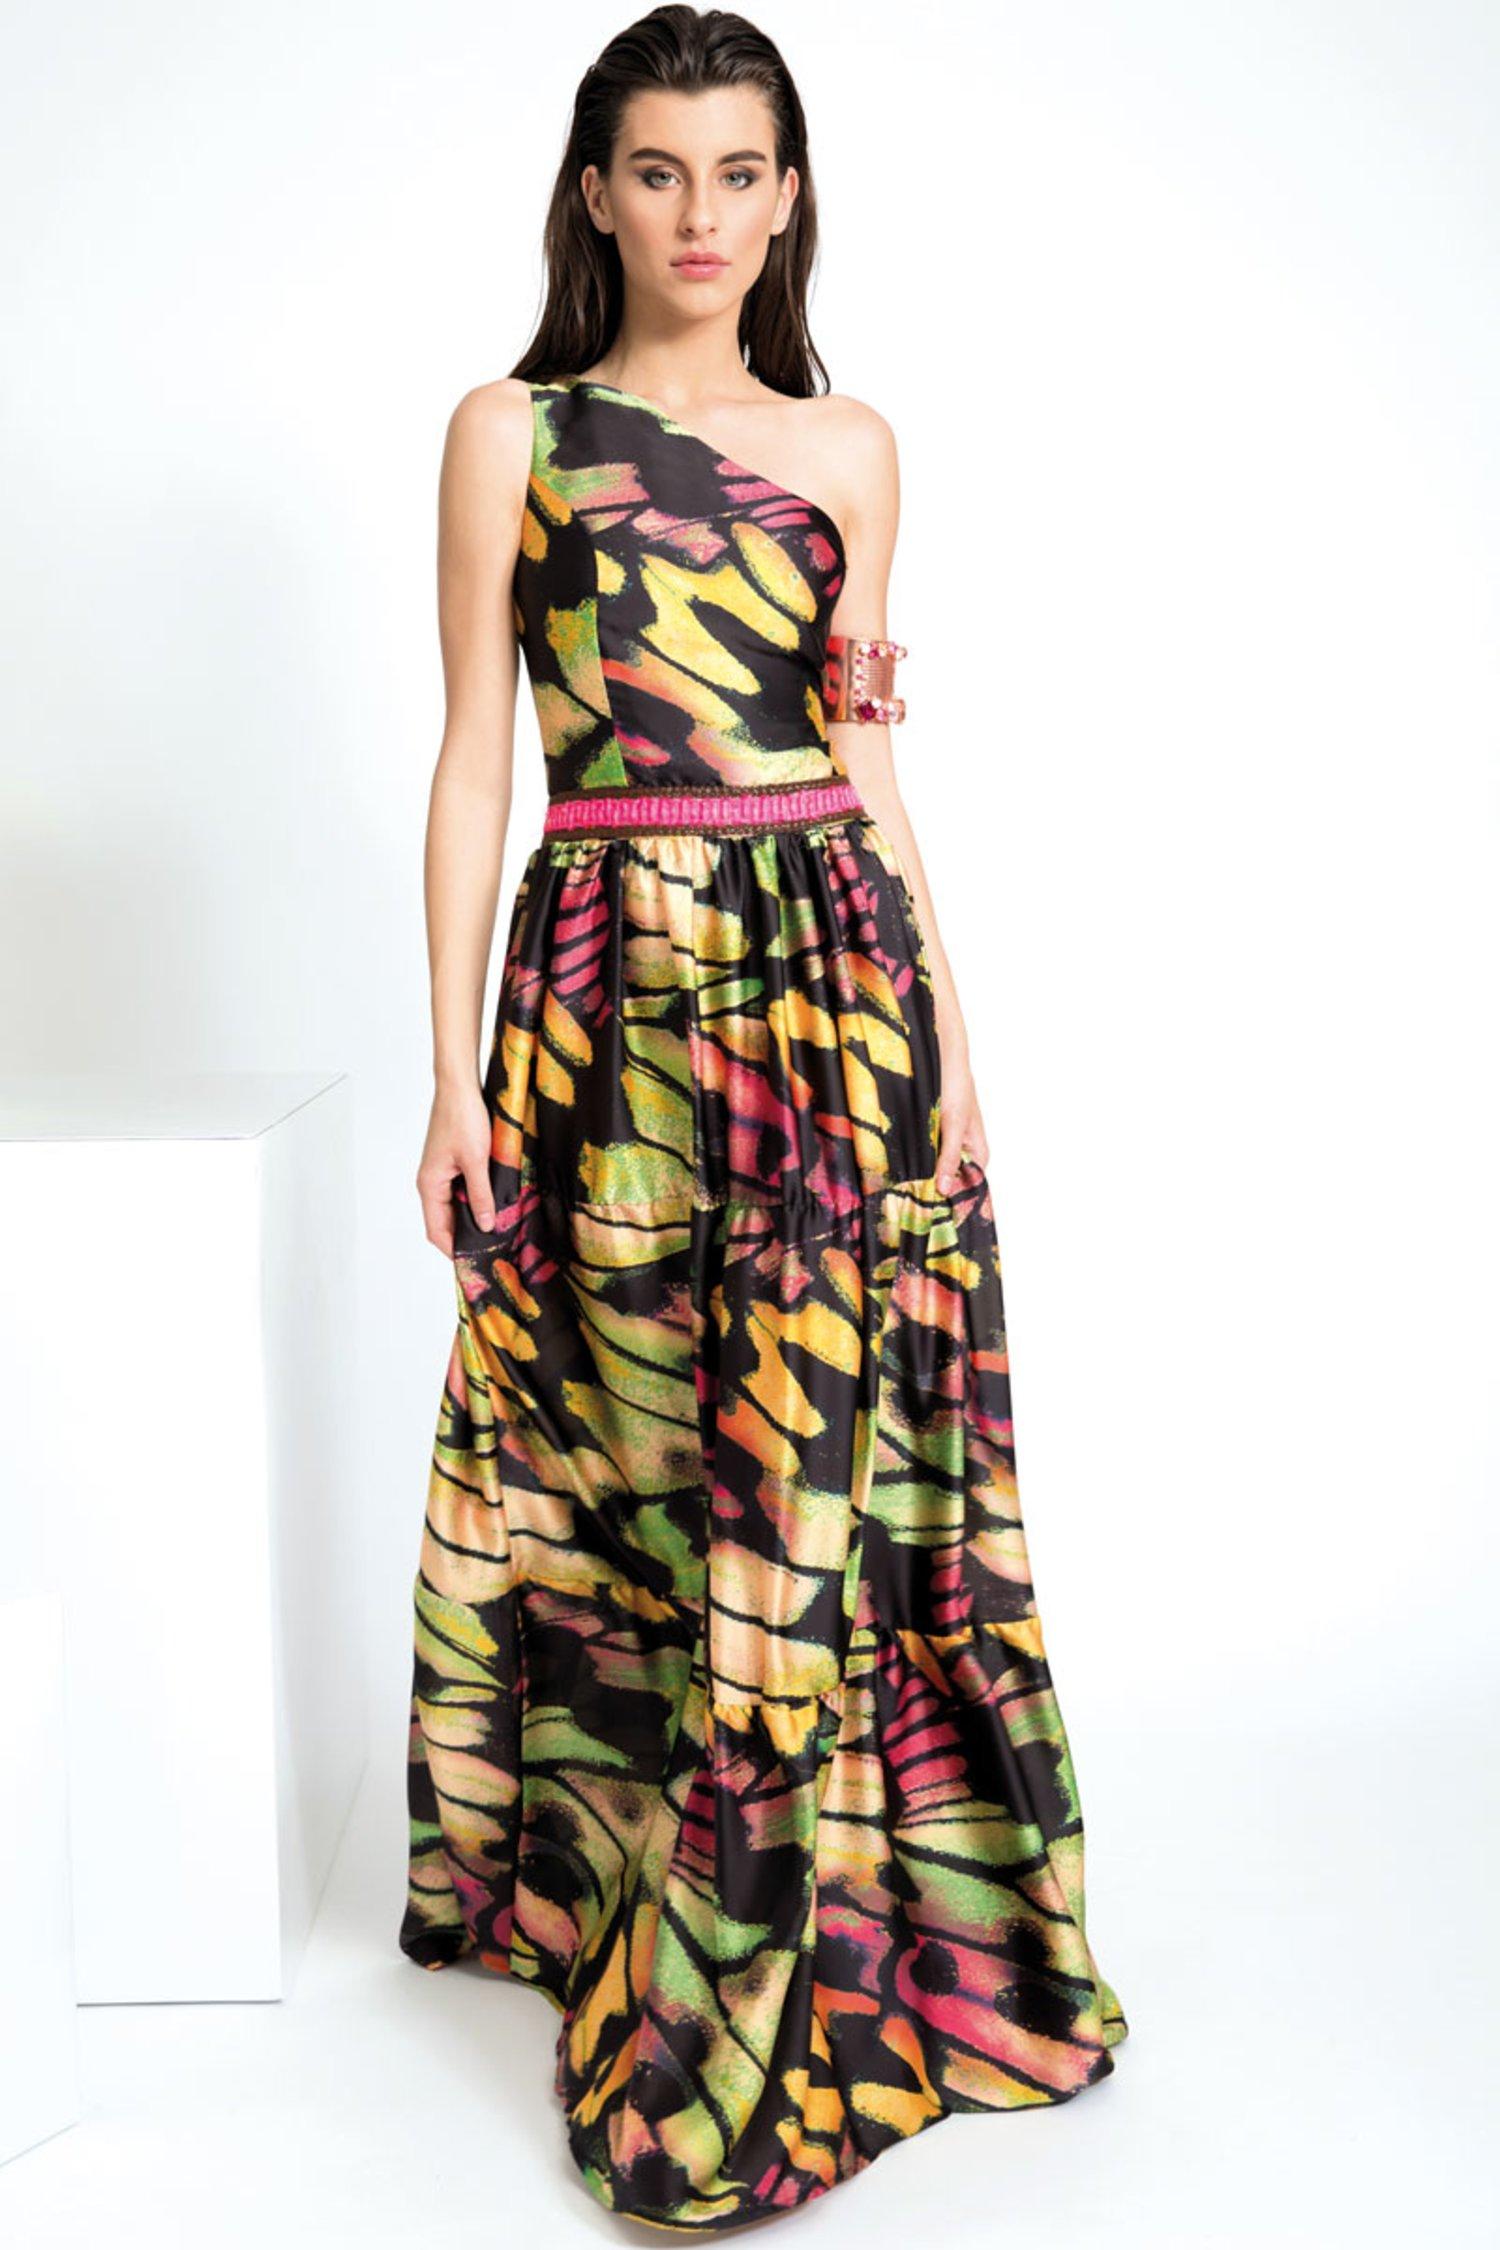 SATIN ONE-SHOULDER LONG DRESS WITH WAIST TRIMMING DETAILS - Farfalle Arancio